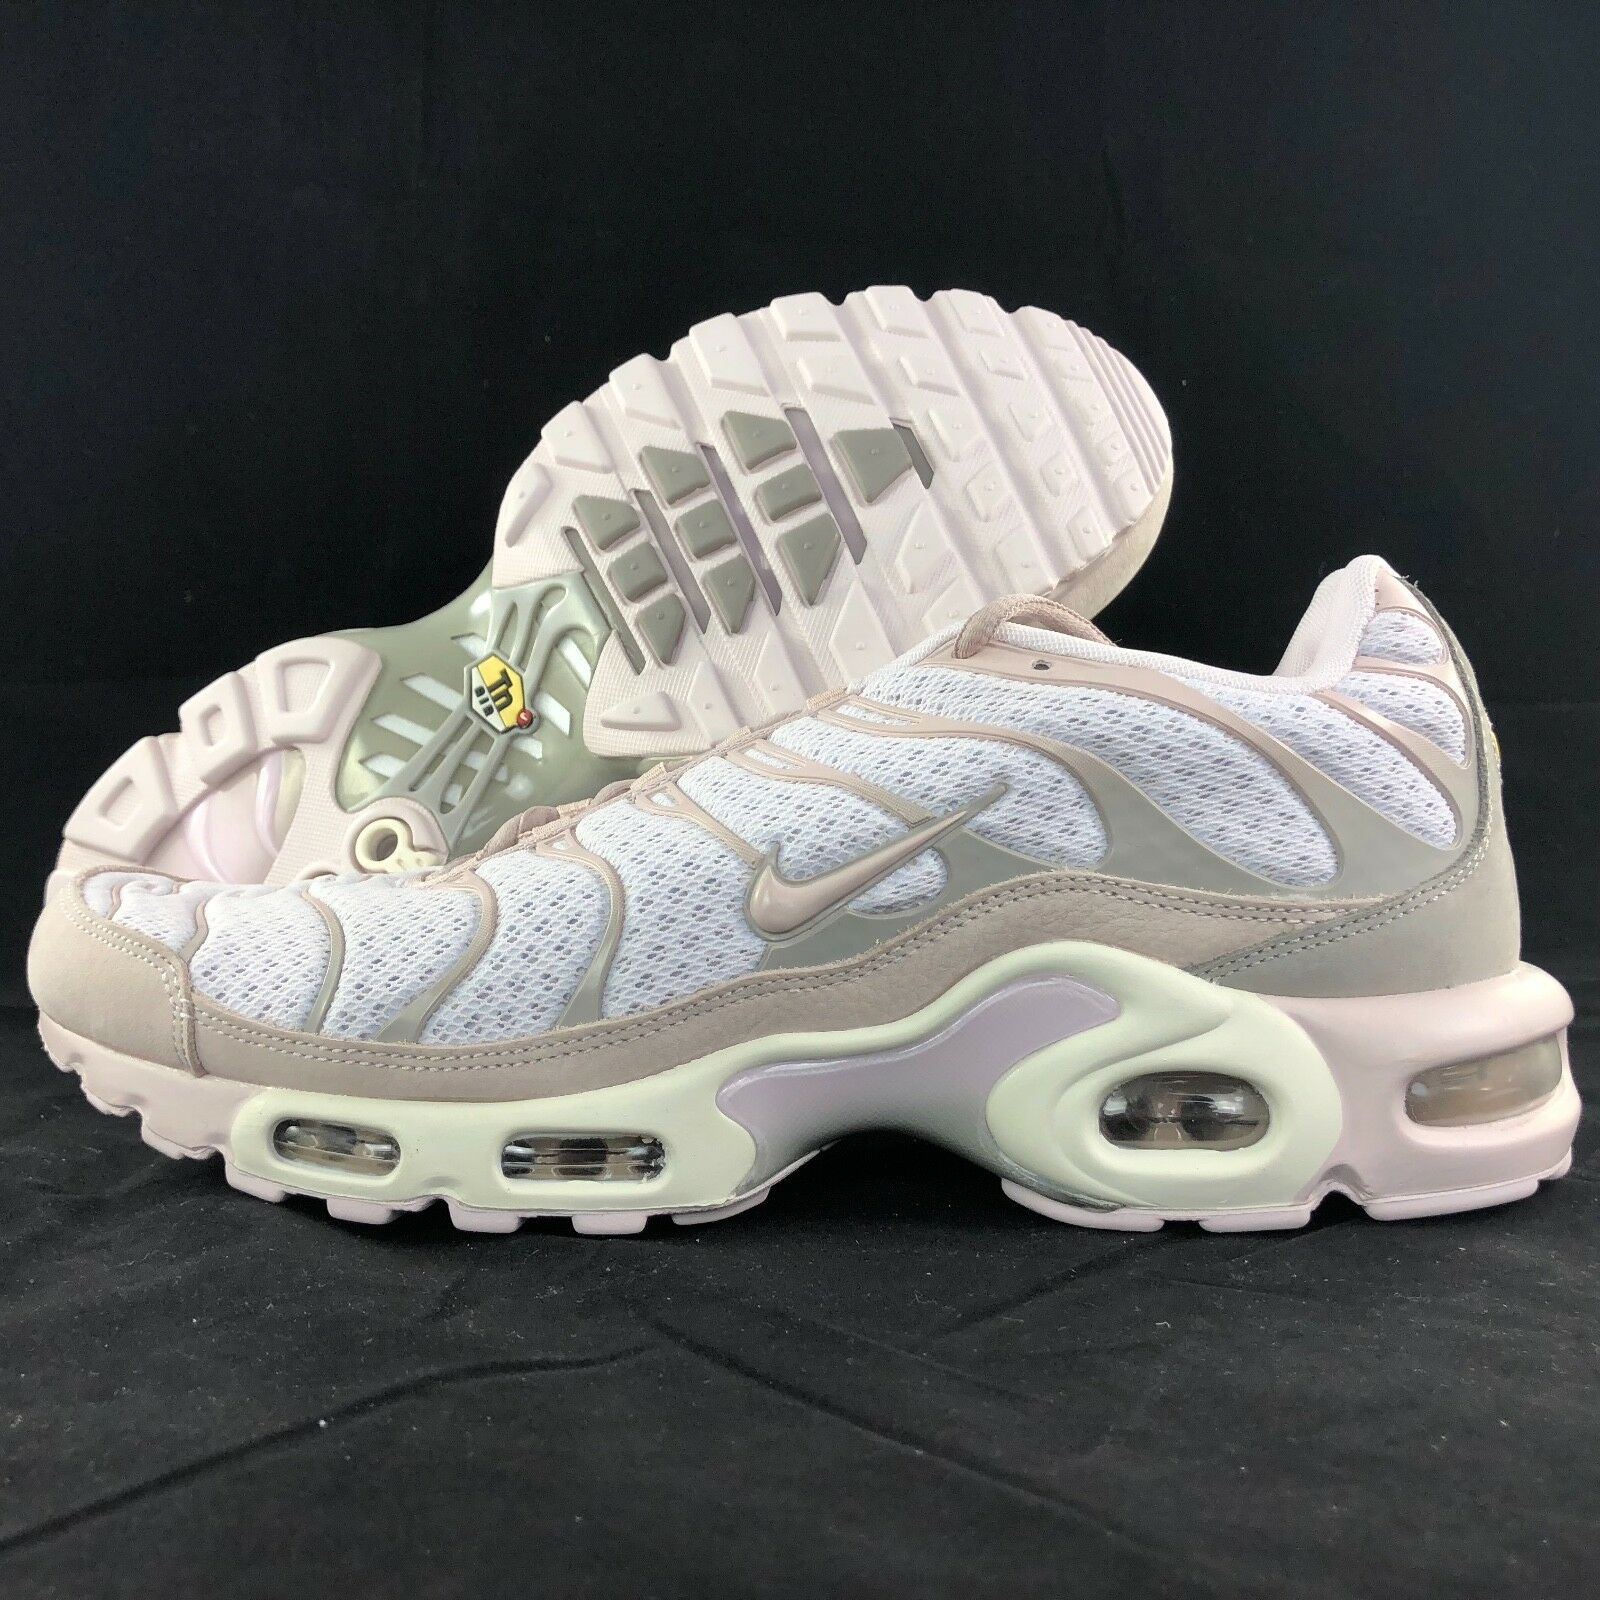 Nike NikeLab Air Max Plus Pearl Pink Cobblestone White 898018-600 Men's 10-12